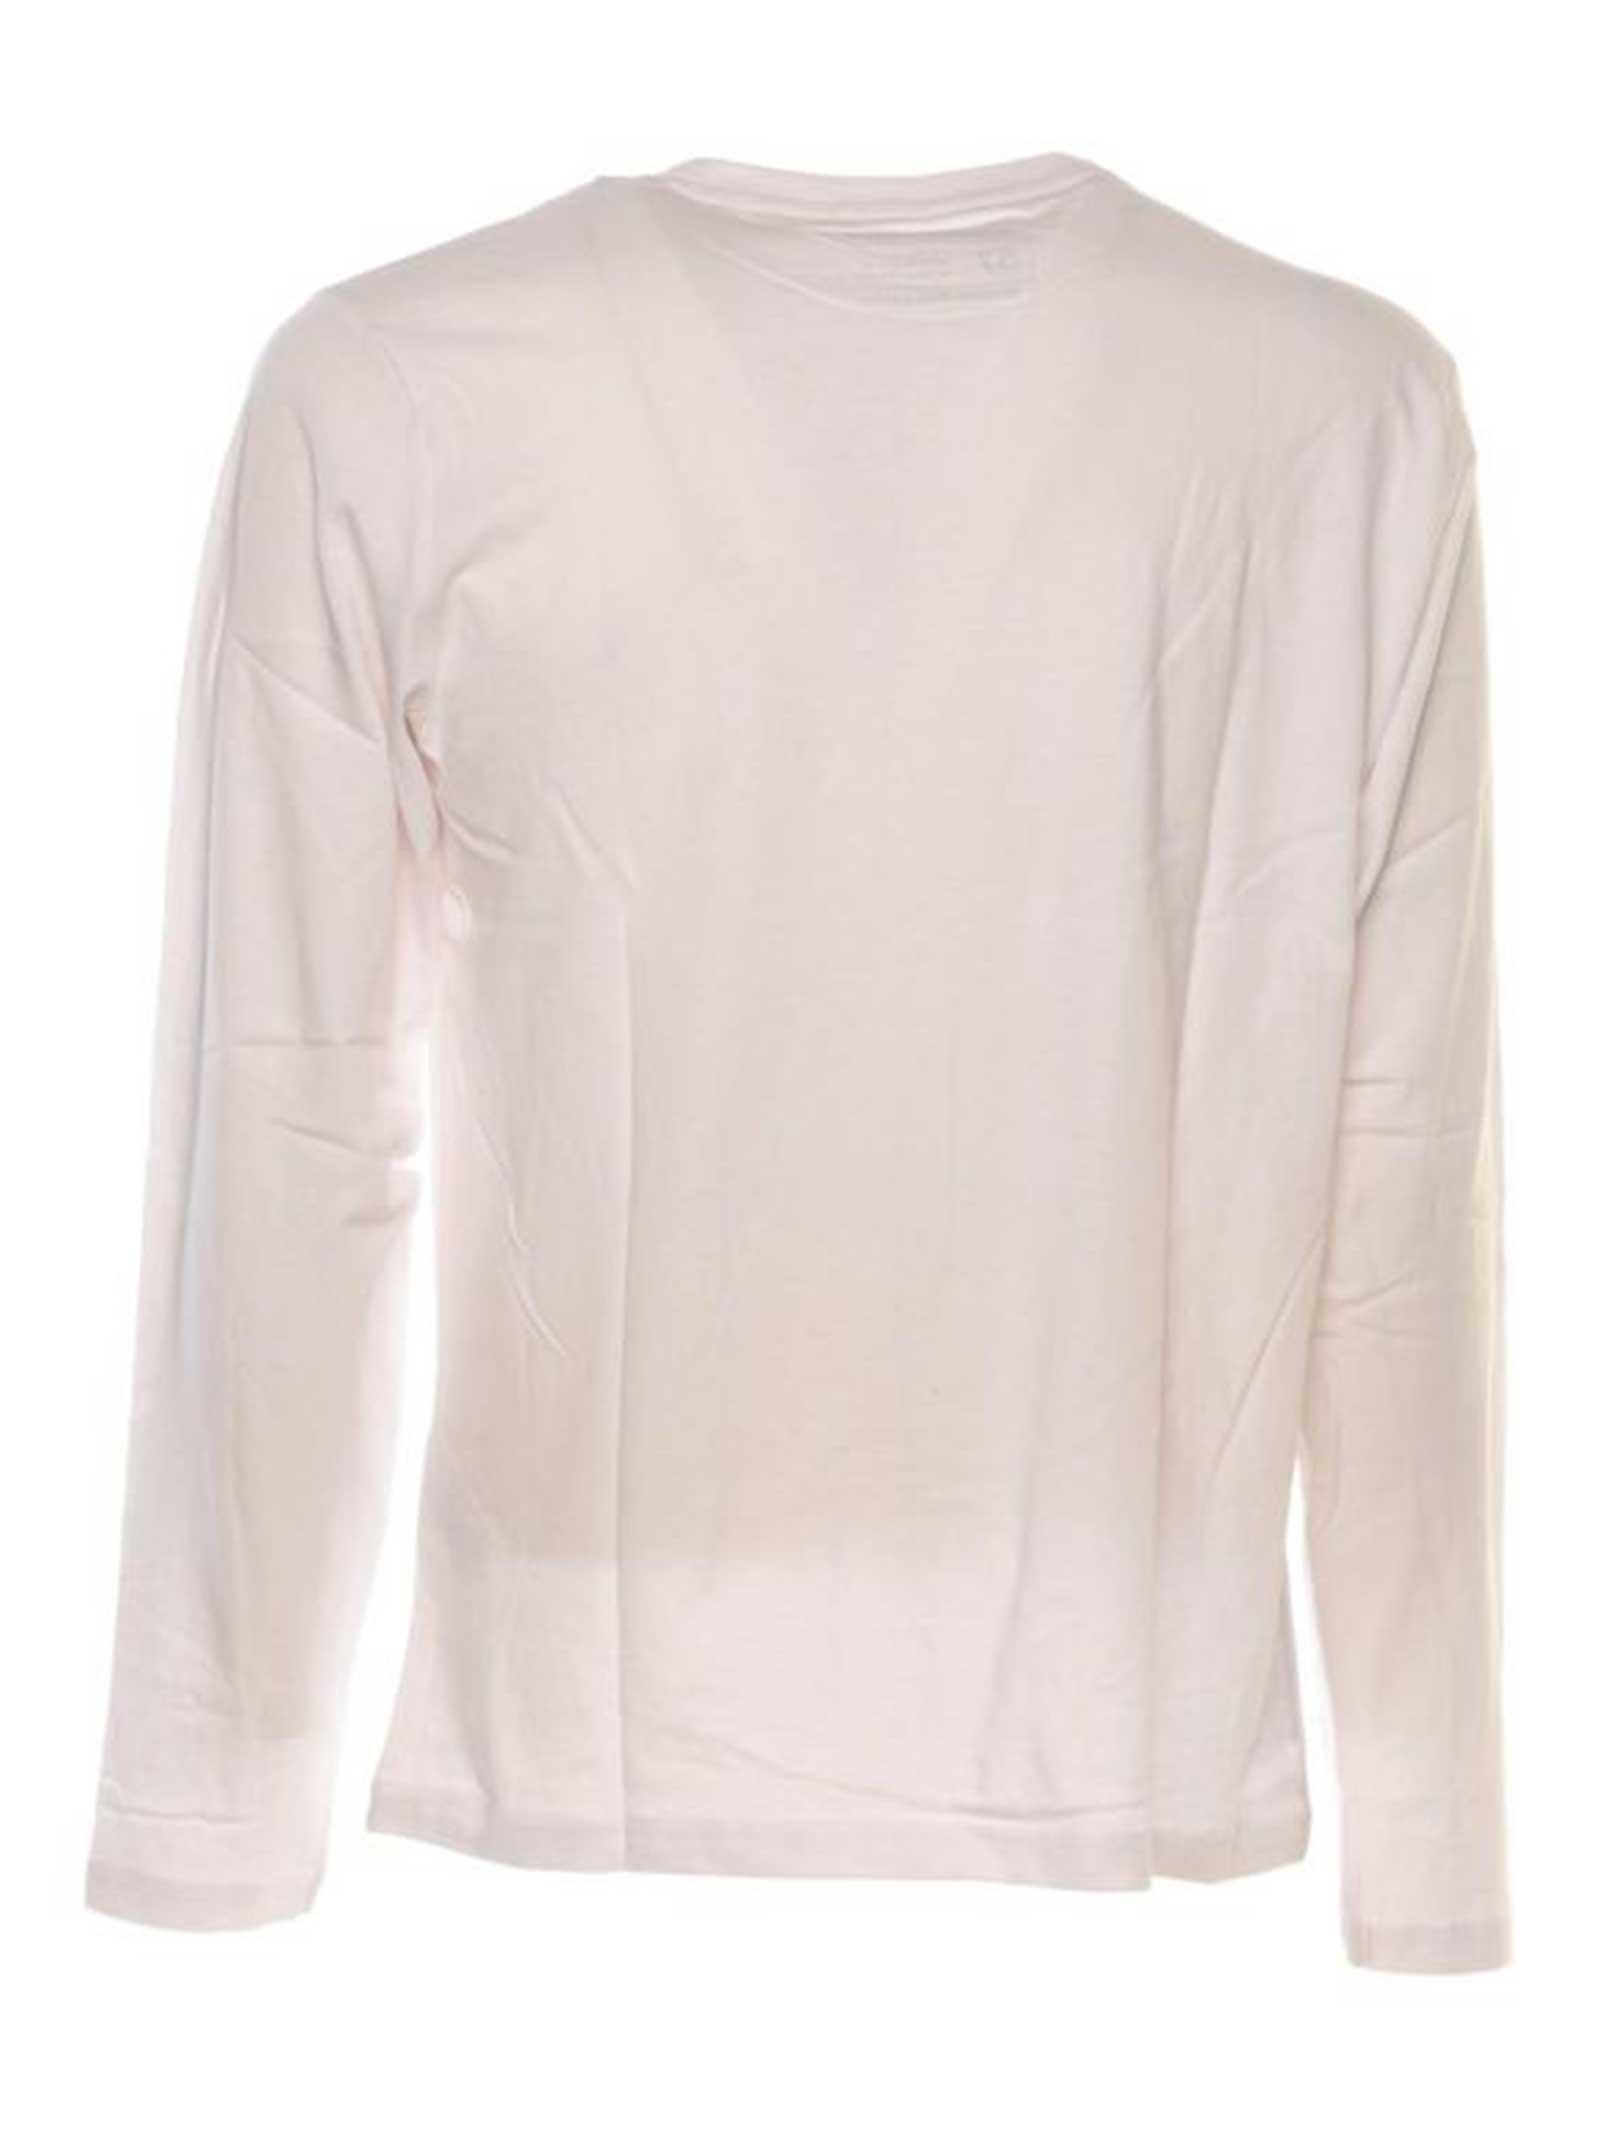 T-SHIRT UOMO NORTH SAILS   T-shirt   6926980101